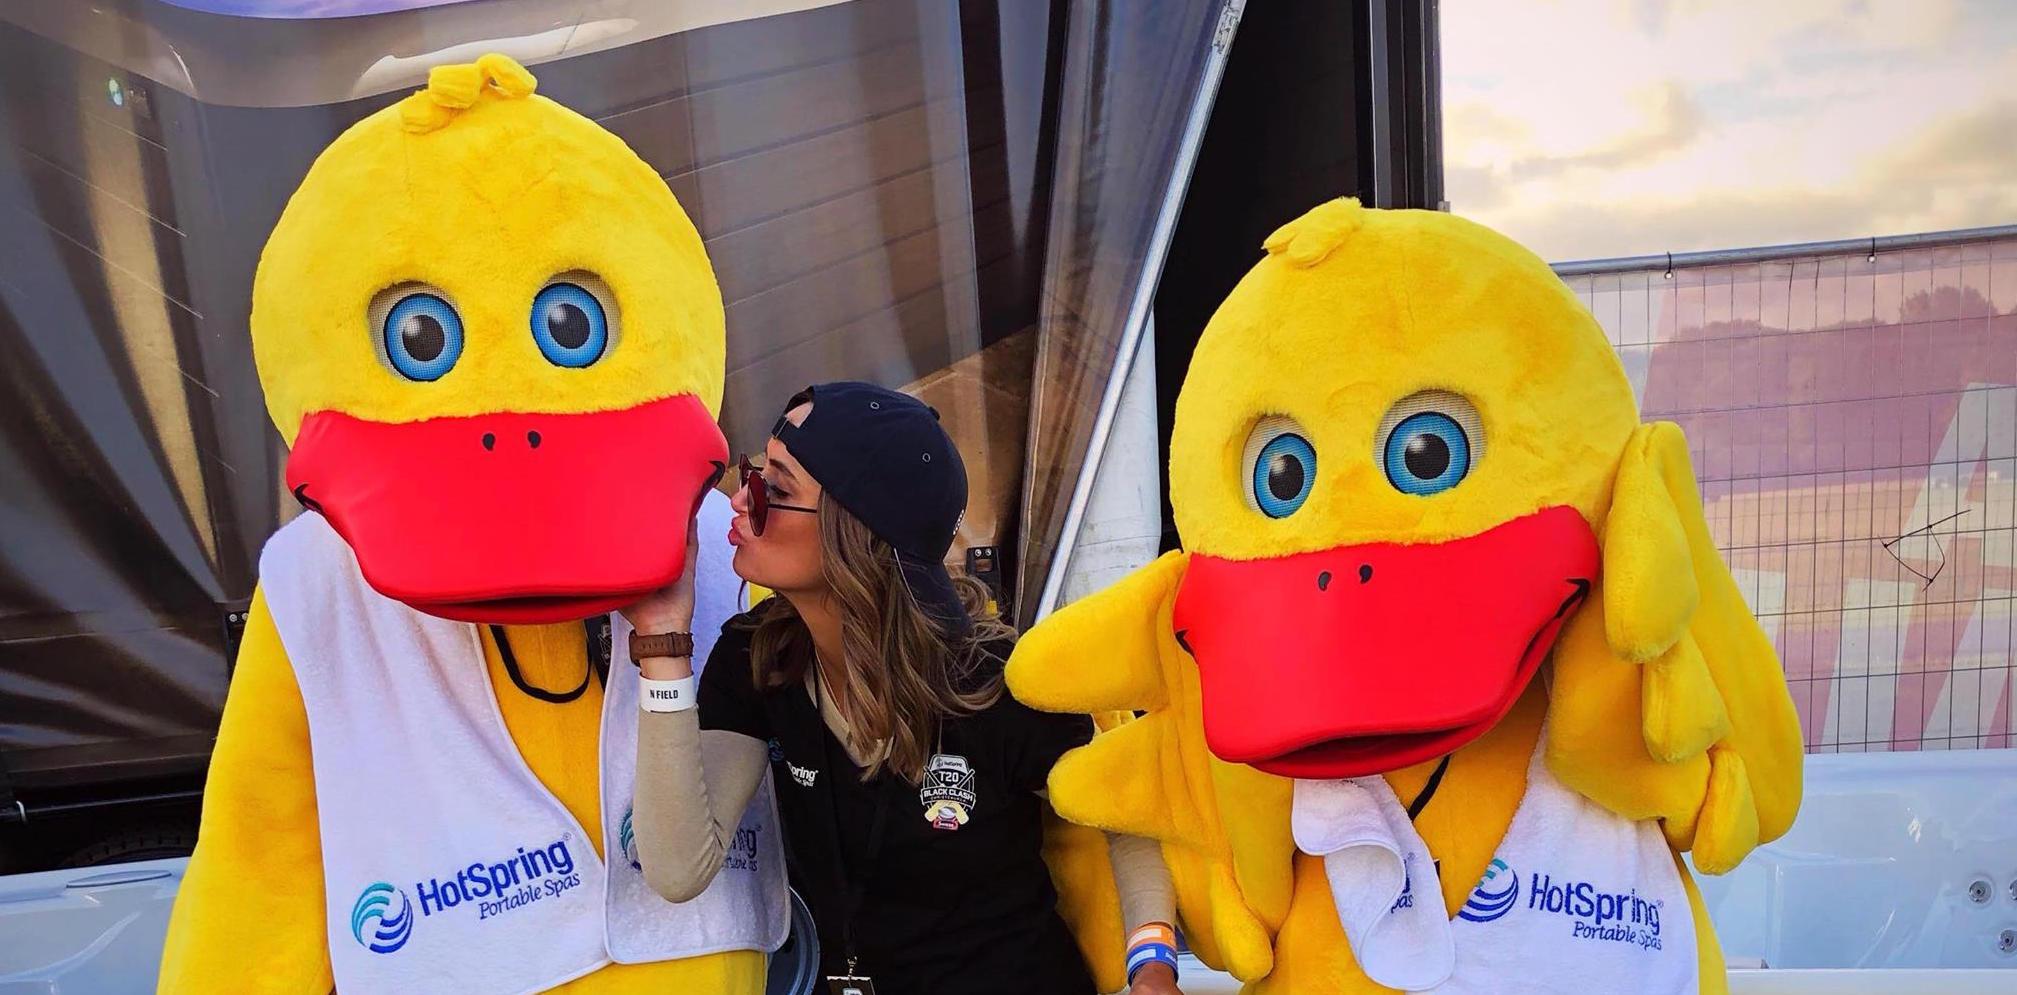 Duck Mascots making a splash!